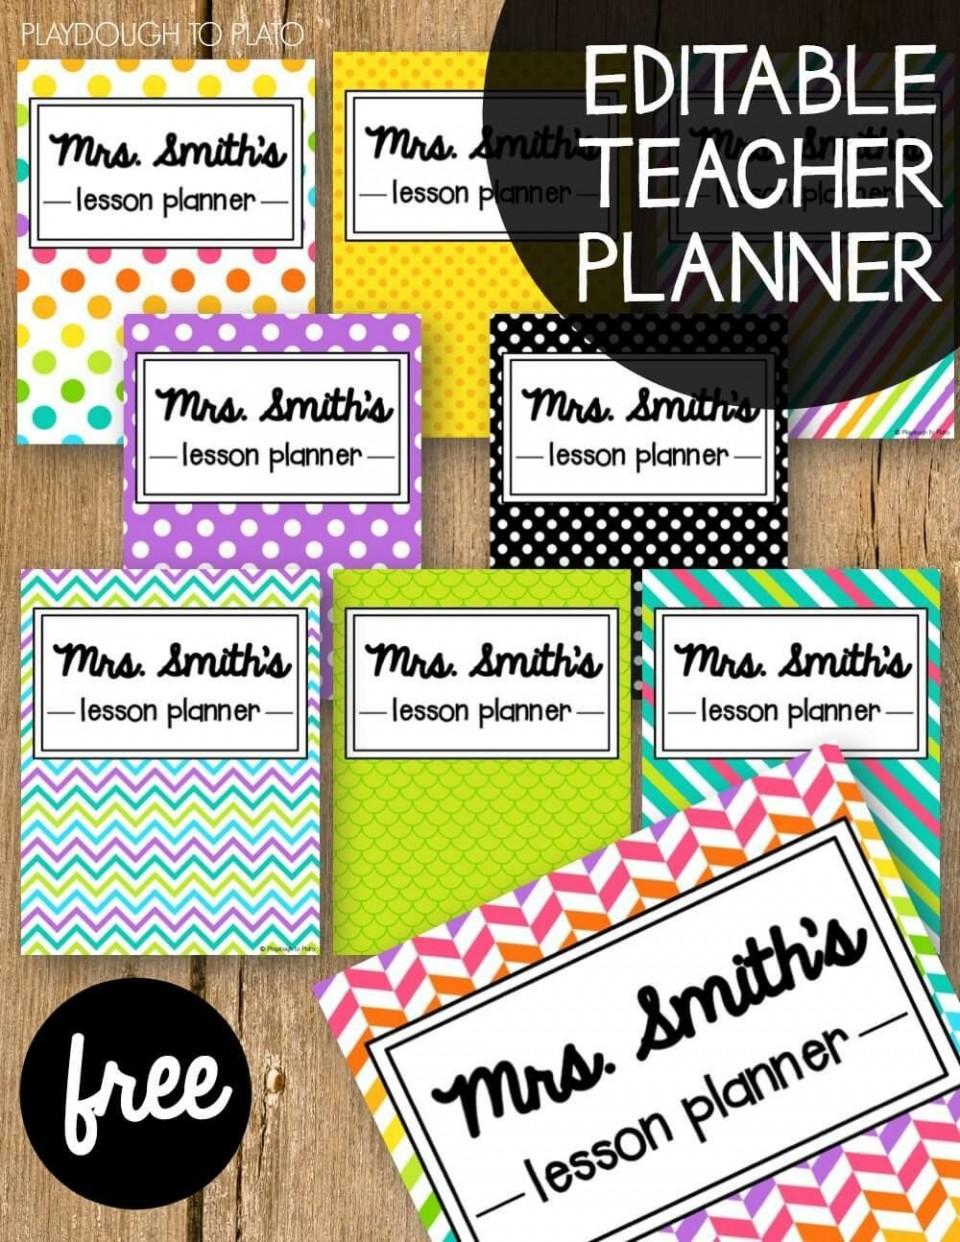 001 Simple Free Printable Teacher Binder Template Idea 960